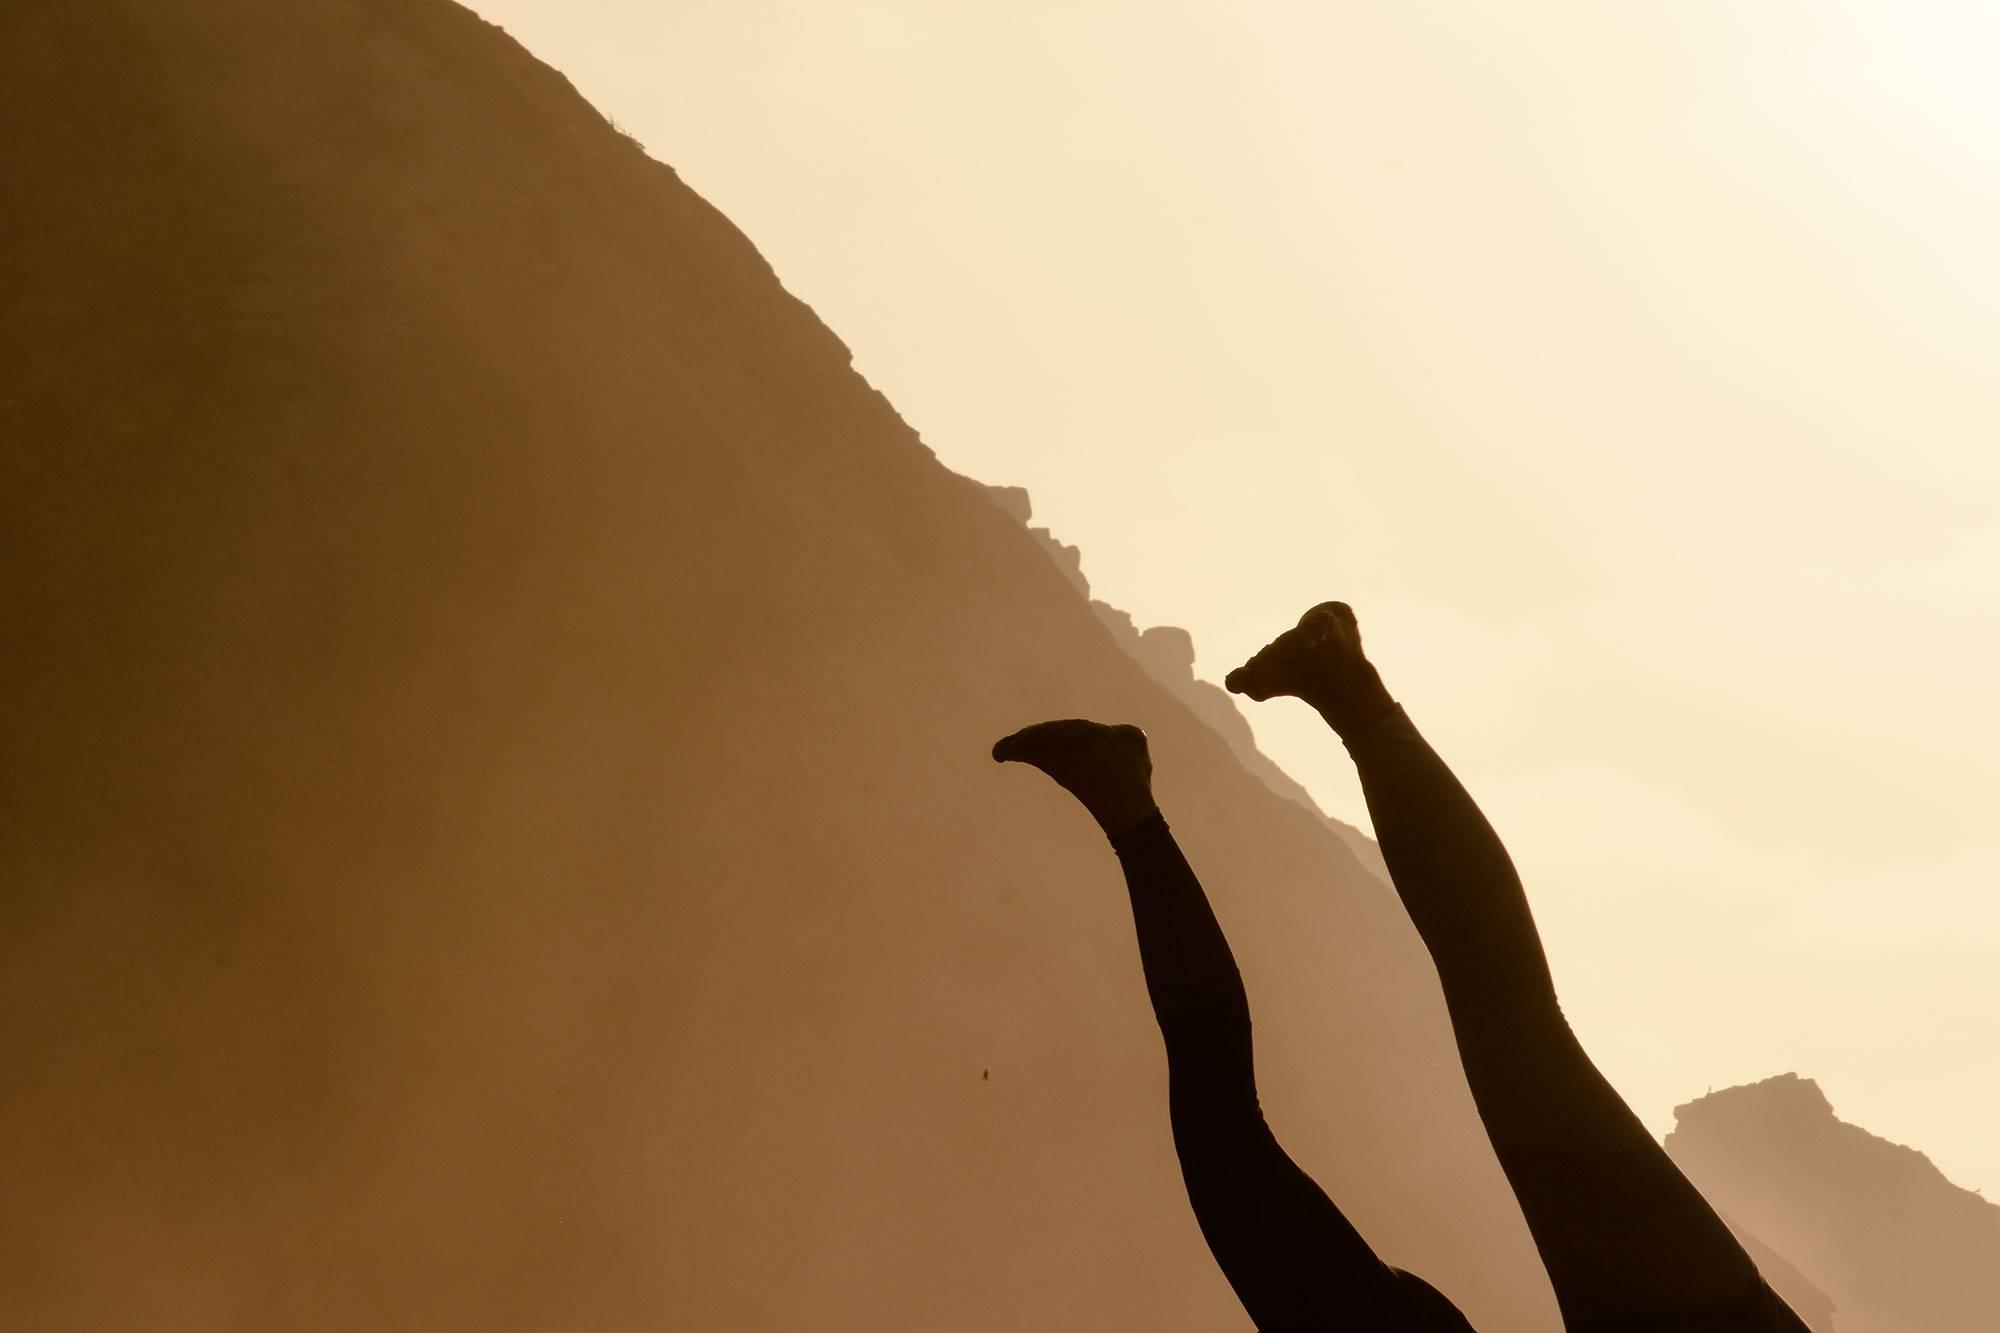 https://www.soulandsurf.com/wp-content/uploads/2021/07/@katiearaephoto_Yoga_On-the-beach_3.jpg